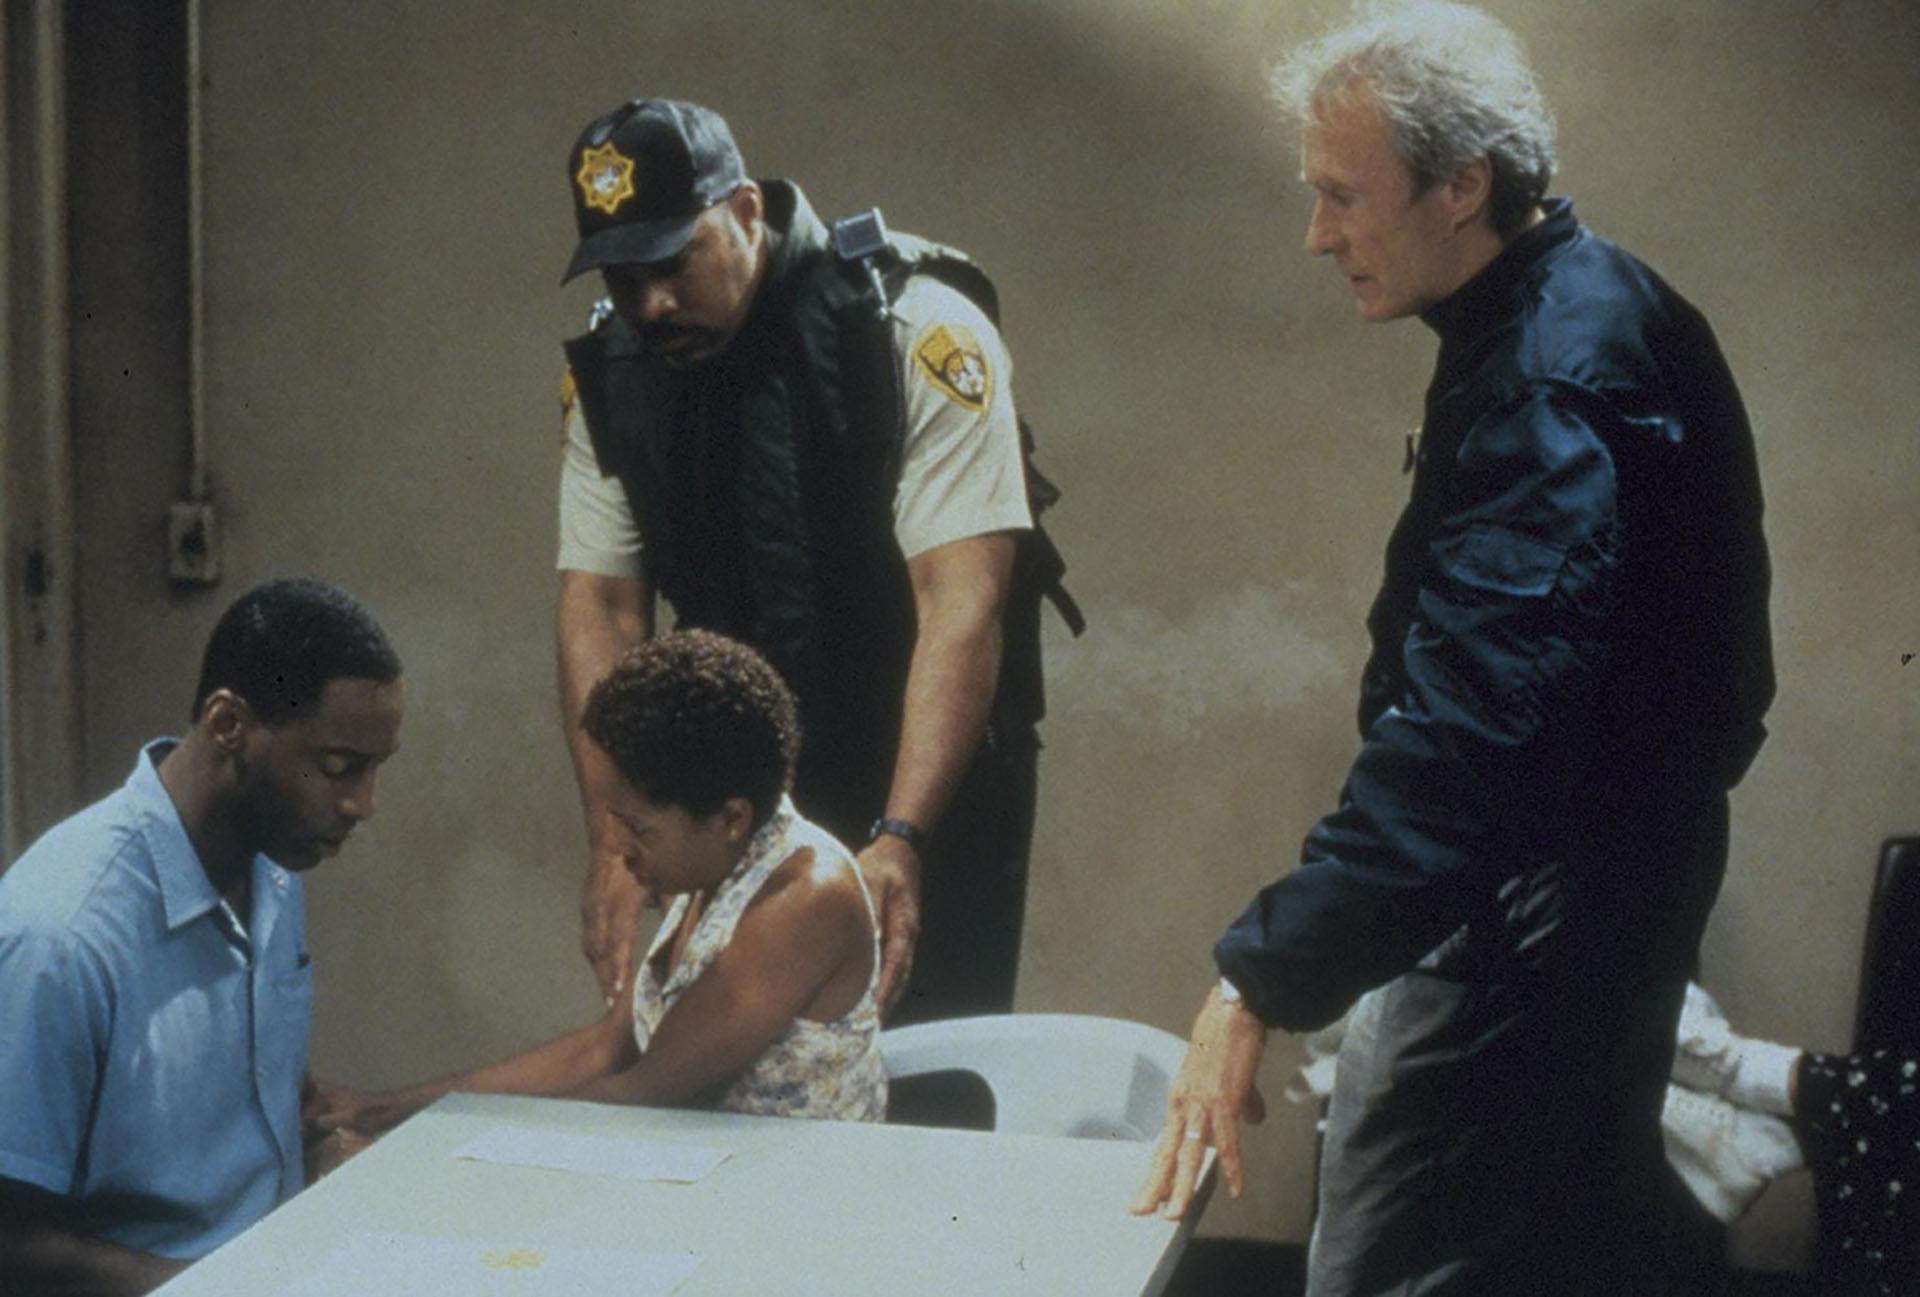 """Crimen verdadero"": Clint Eastwood, como periodista justiciero"